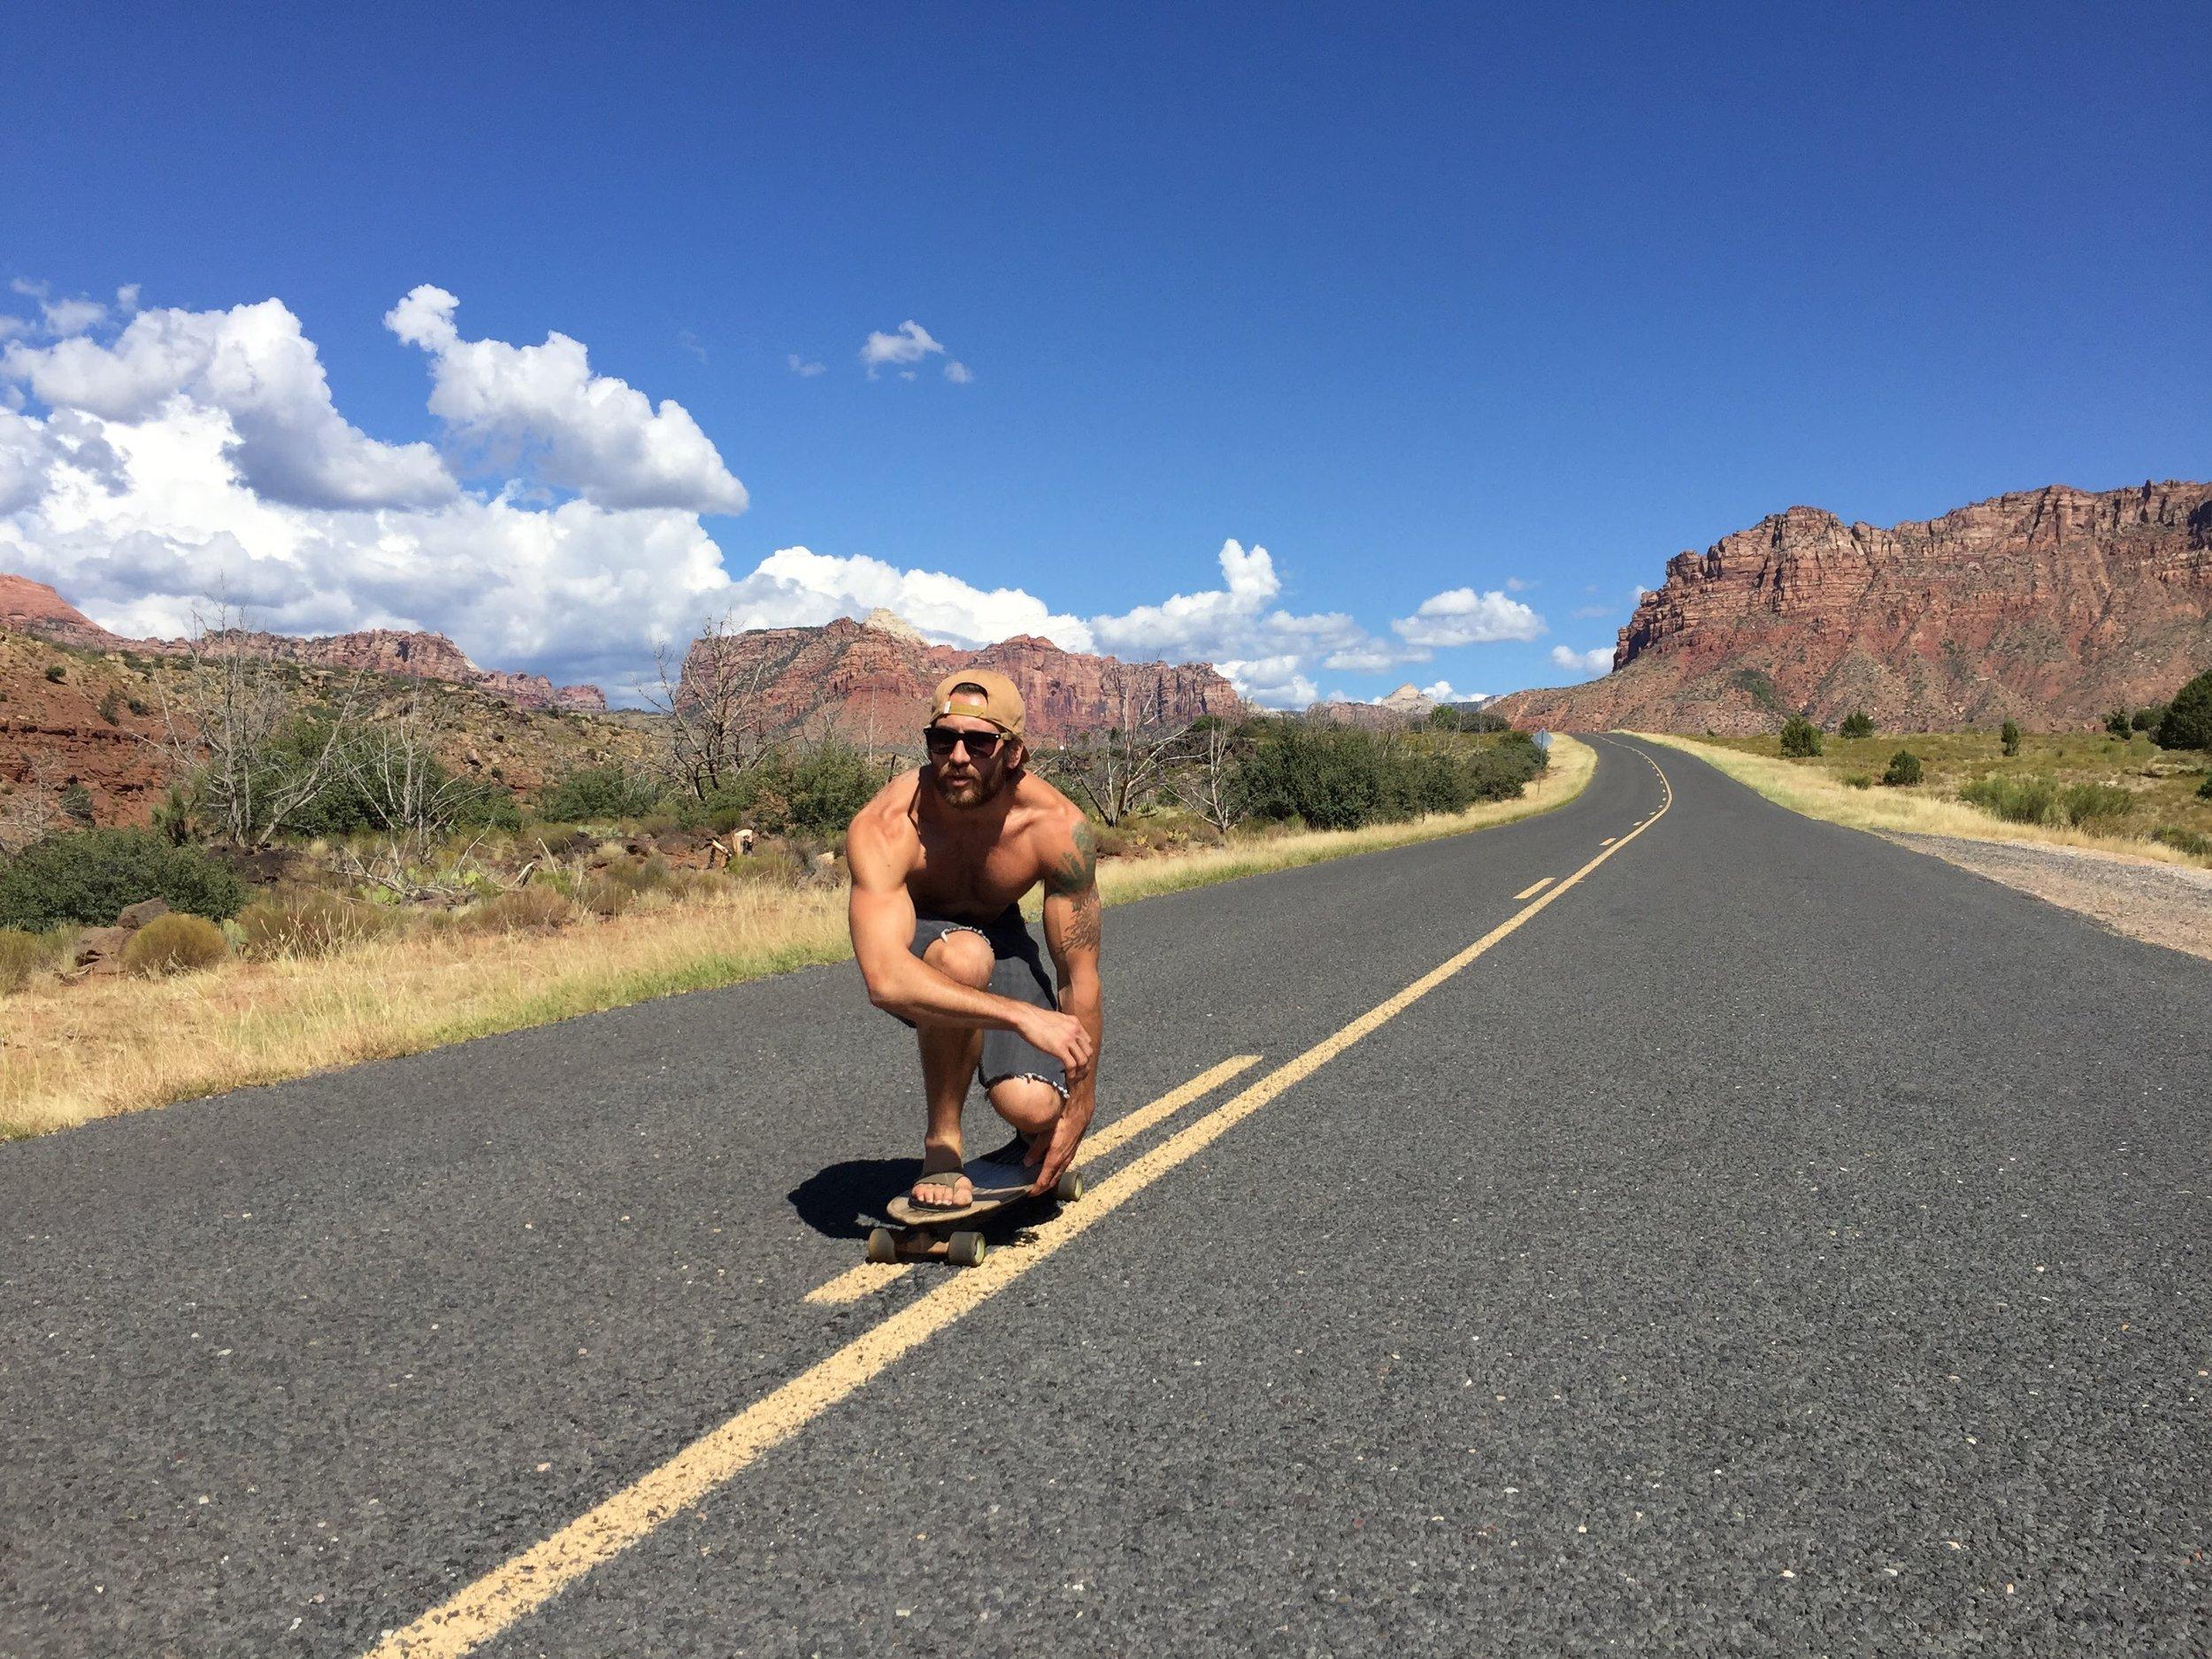 Aaron Medeiros skateboarding in Zion, Utah - 3 Days*